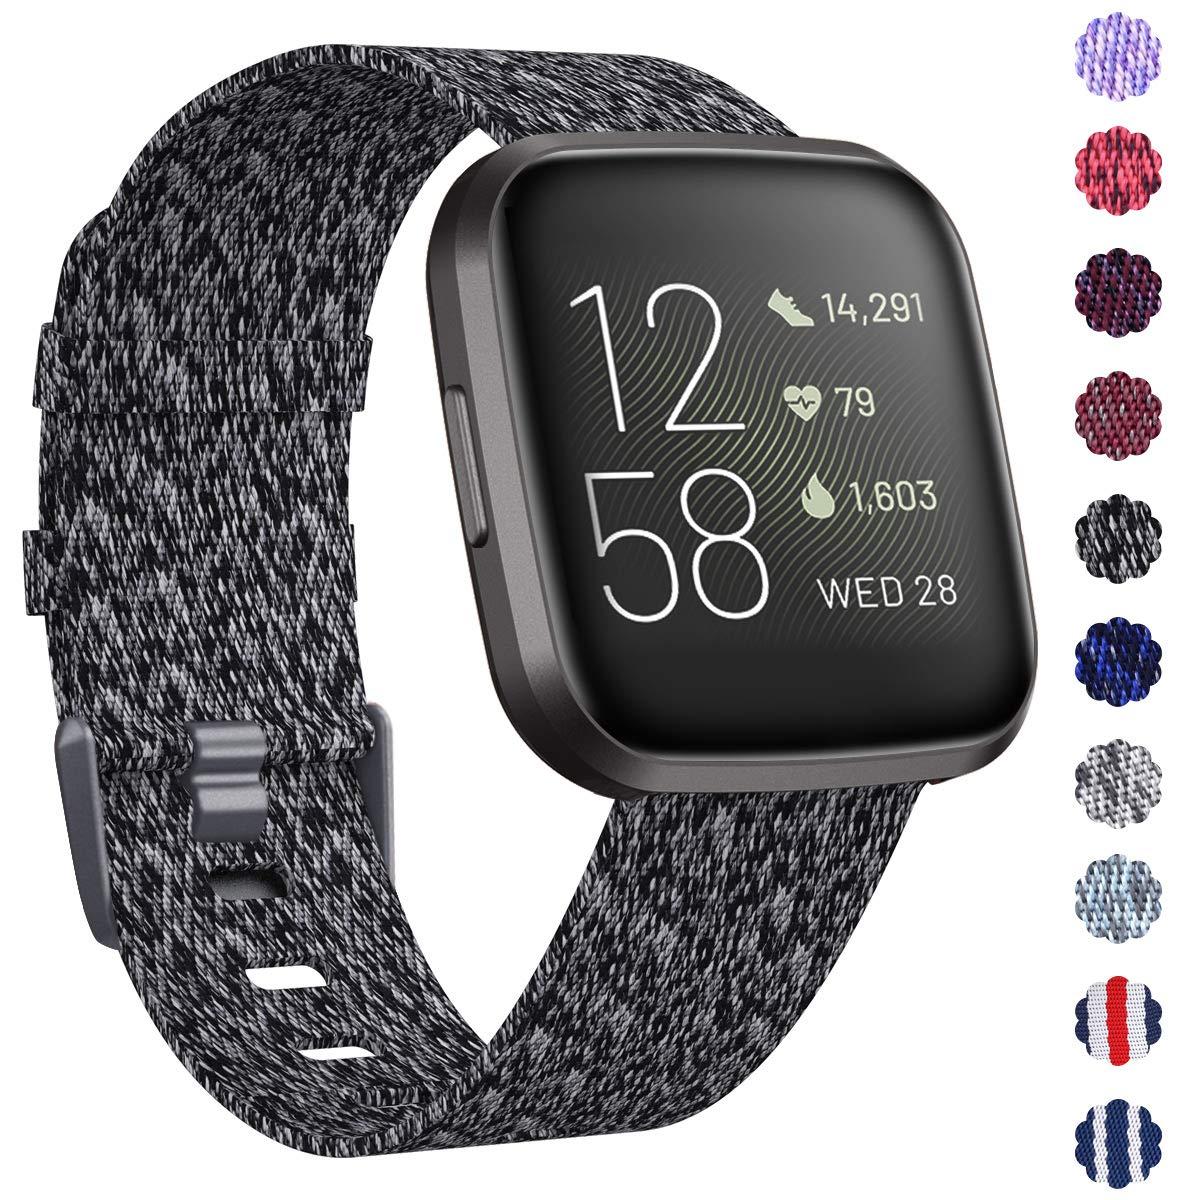 Malla Reloj Fitbit Versa/fitbit Versa 2 . Talle S Negro